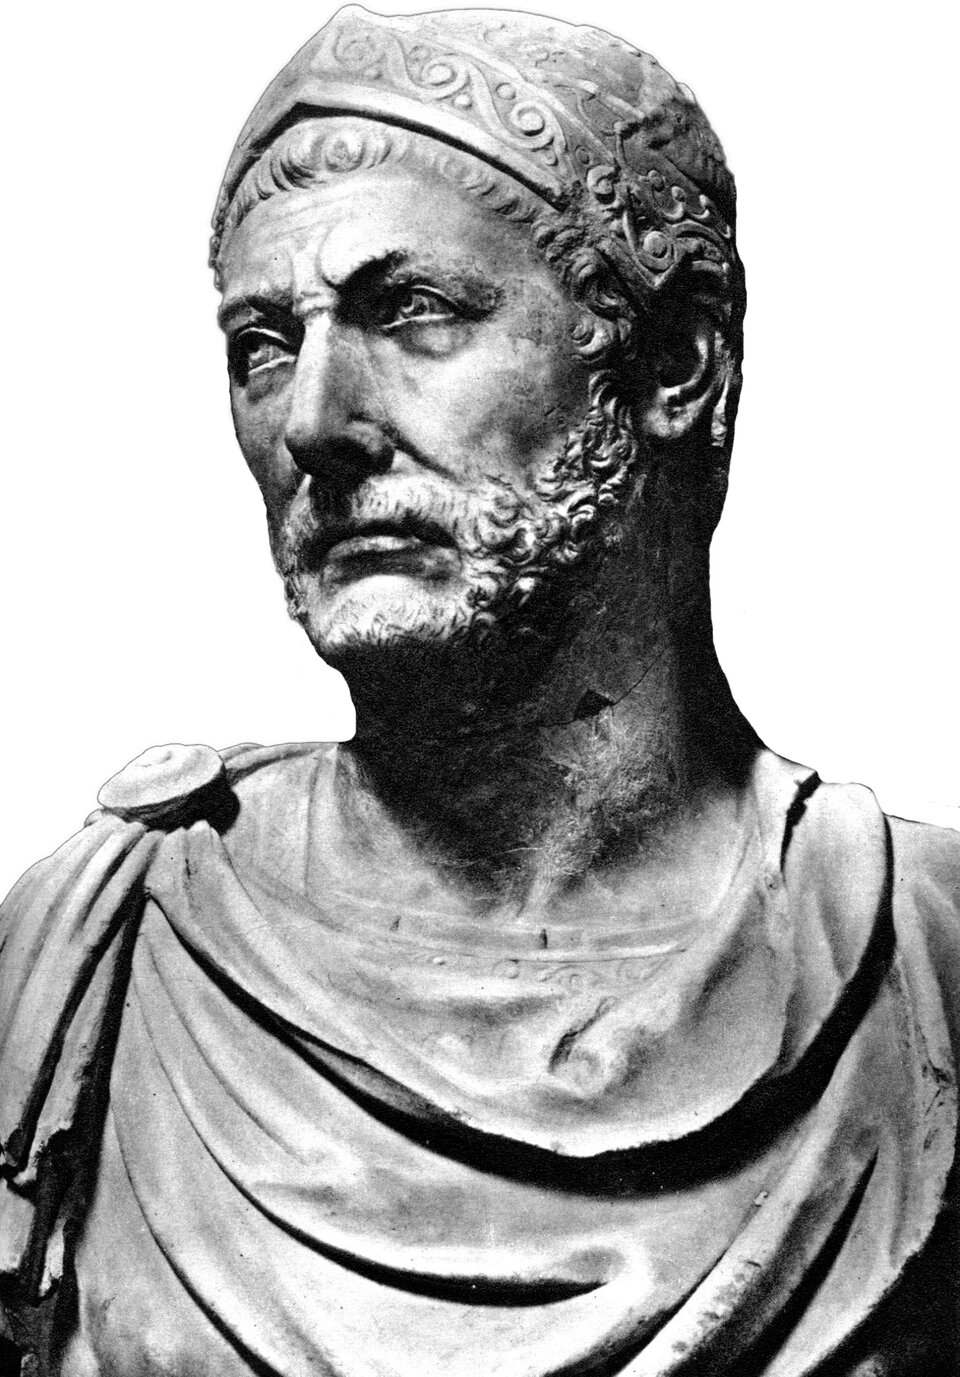 Popiersie Hannibala Popiersie Hannibala Źródło: domena publiczna.